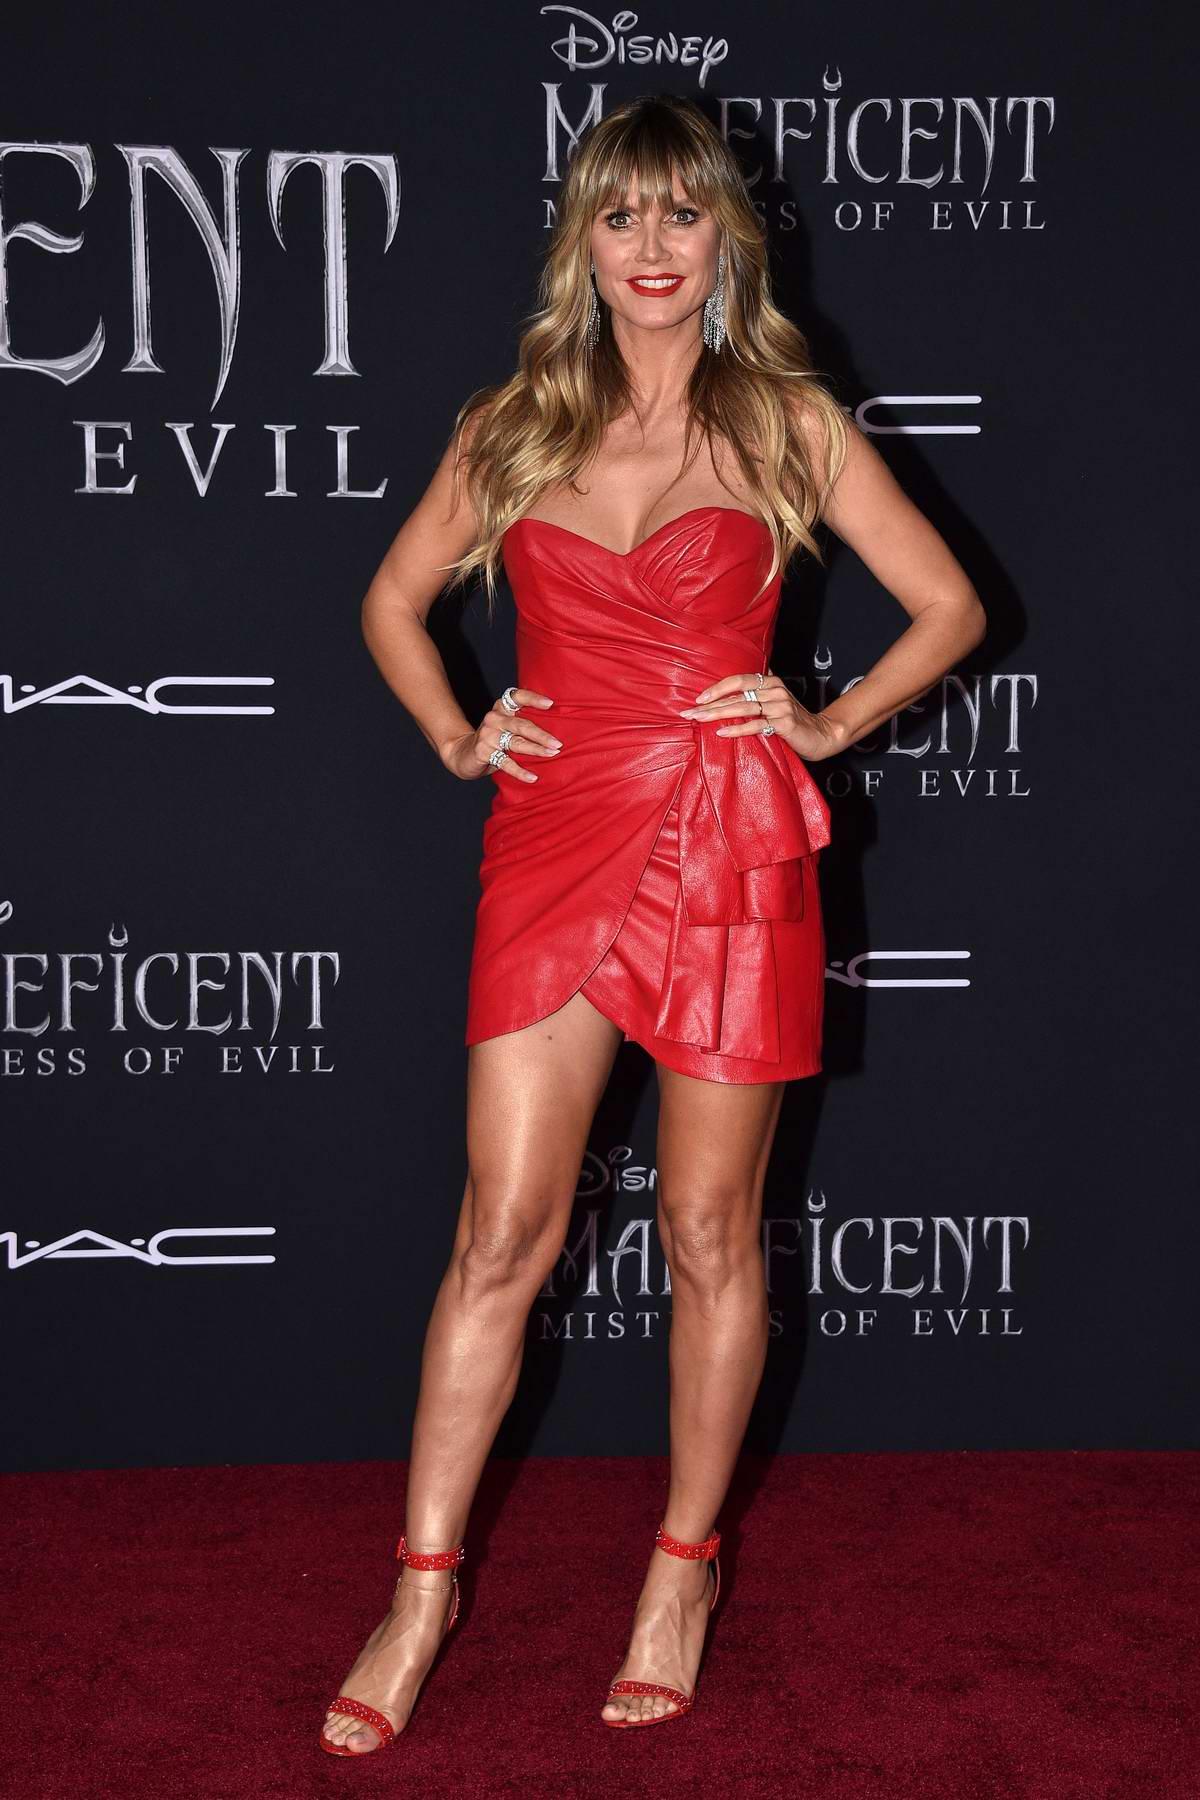 Heidi Klum attends the World Premiere of Disney's 'Maleficent: Mistress of Evil' at El Capitan Theatre in Los Angeles